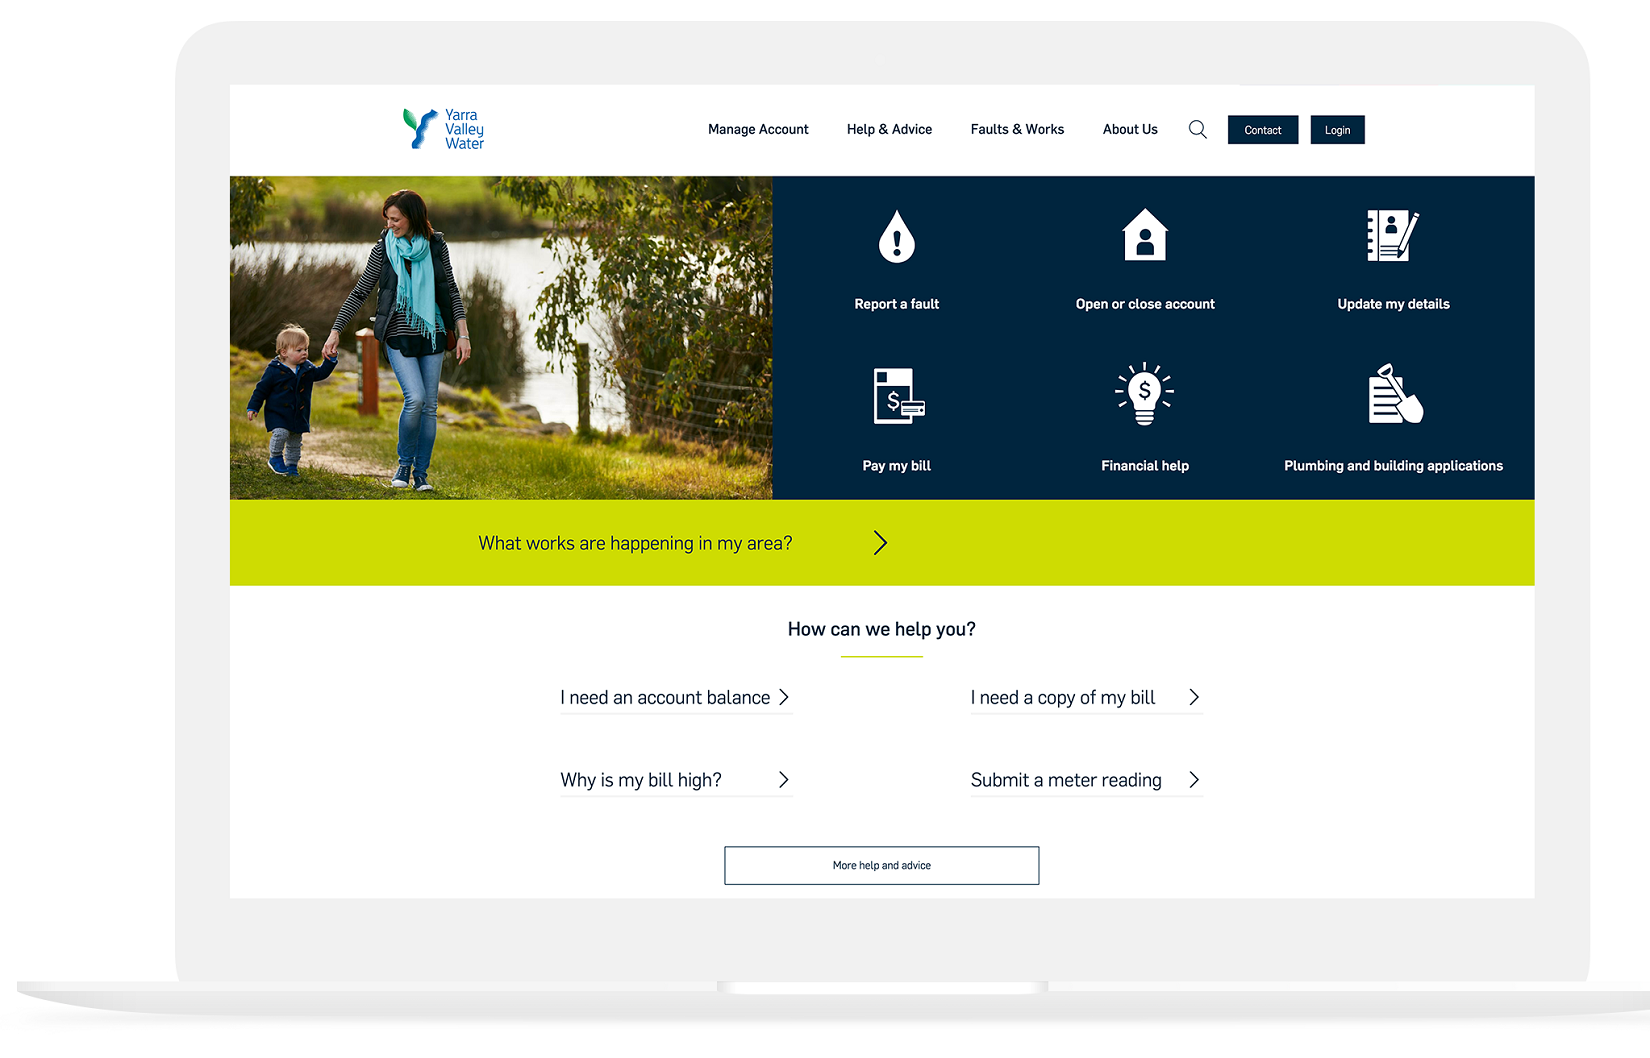 yarra valley water website design case study